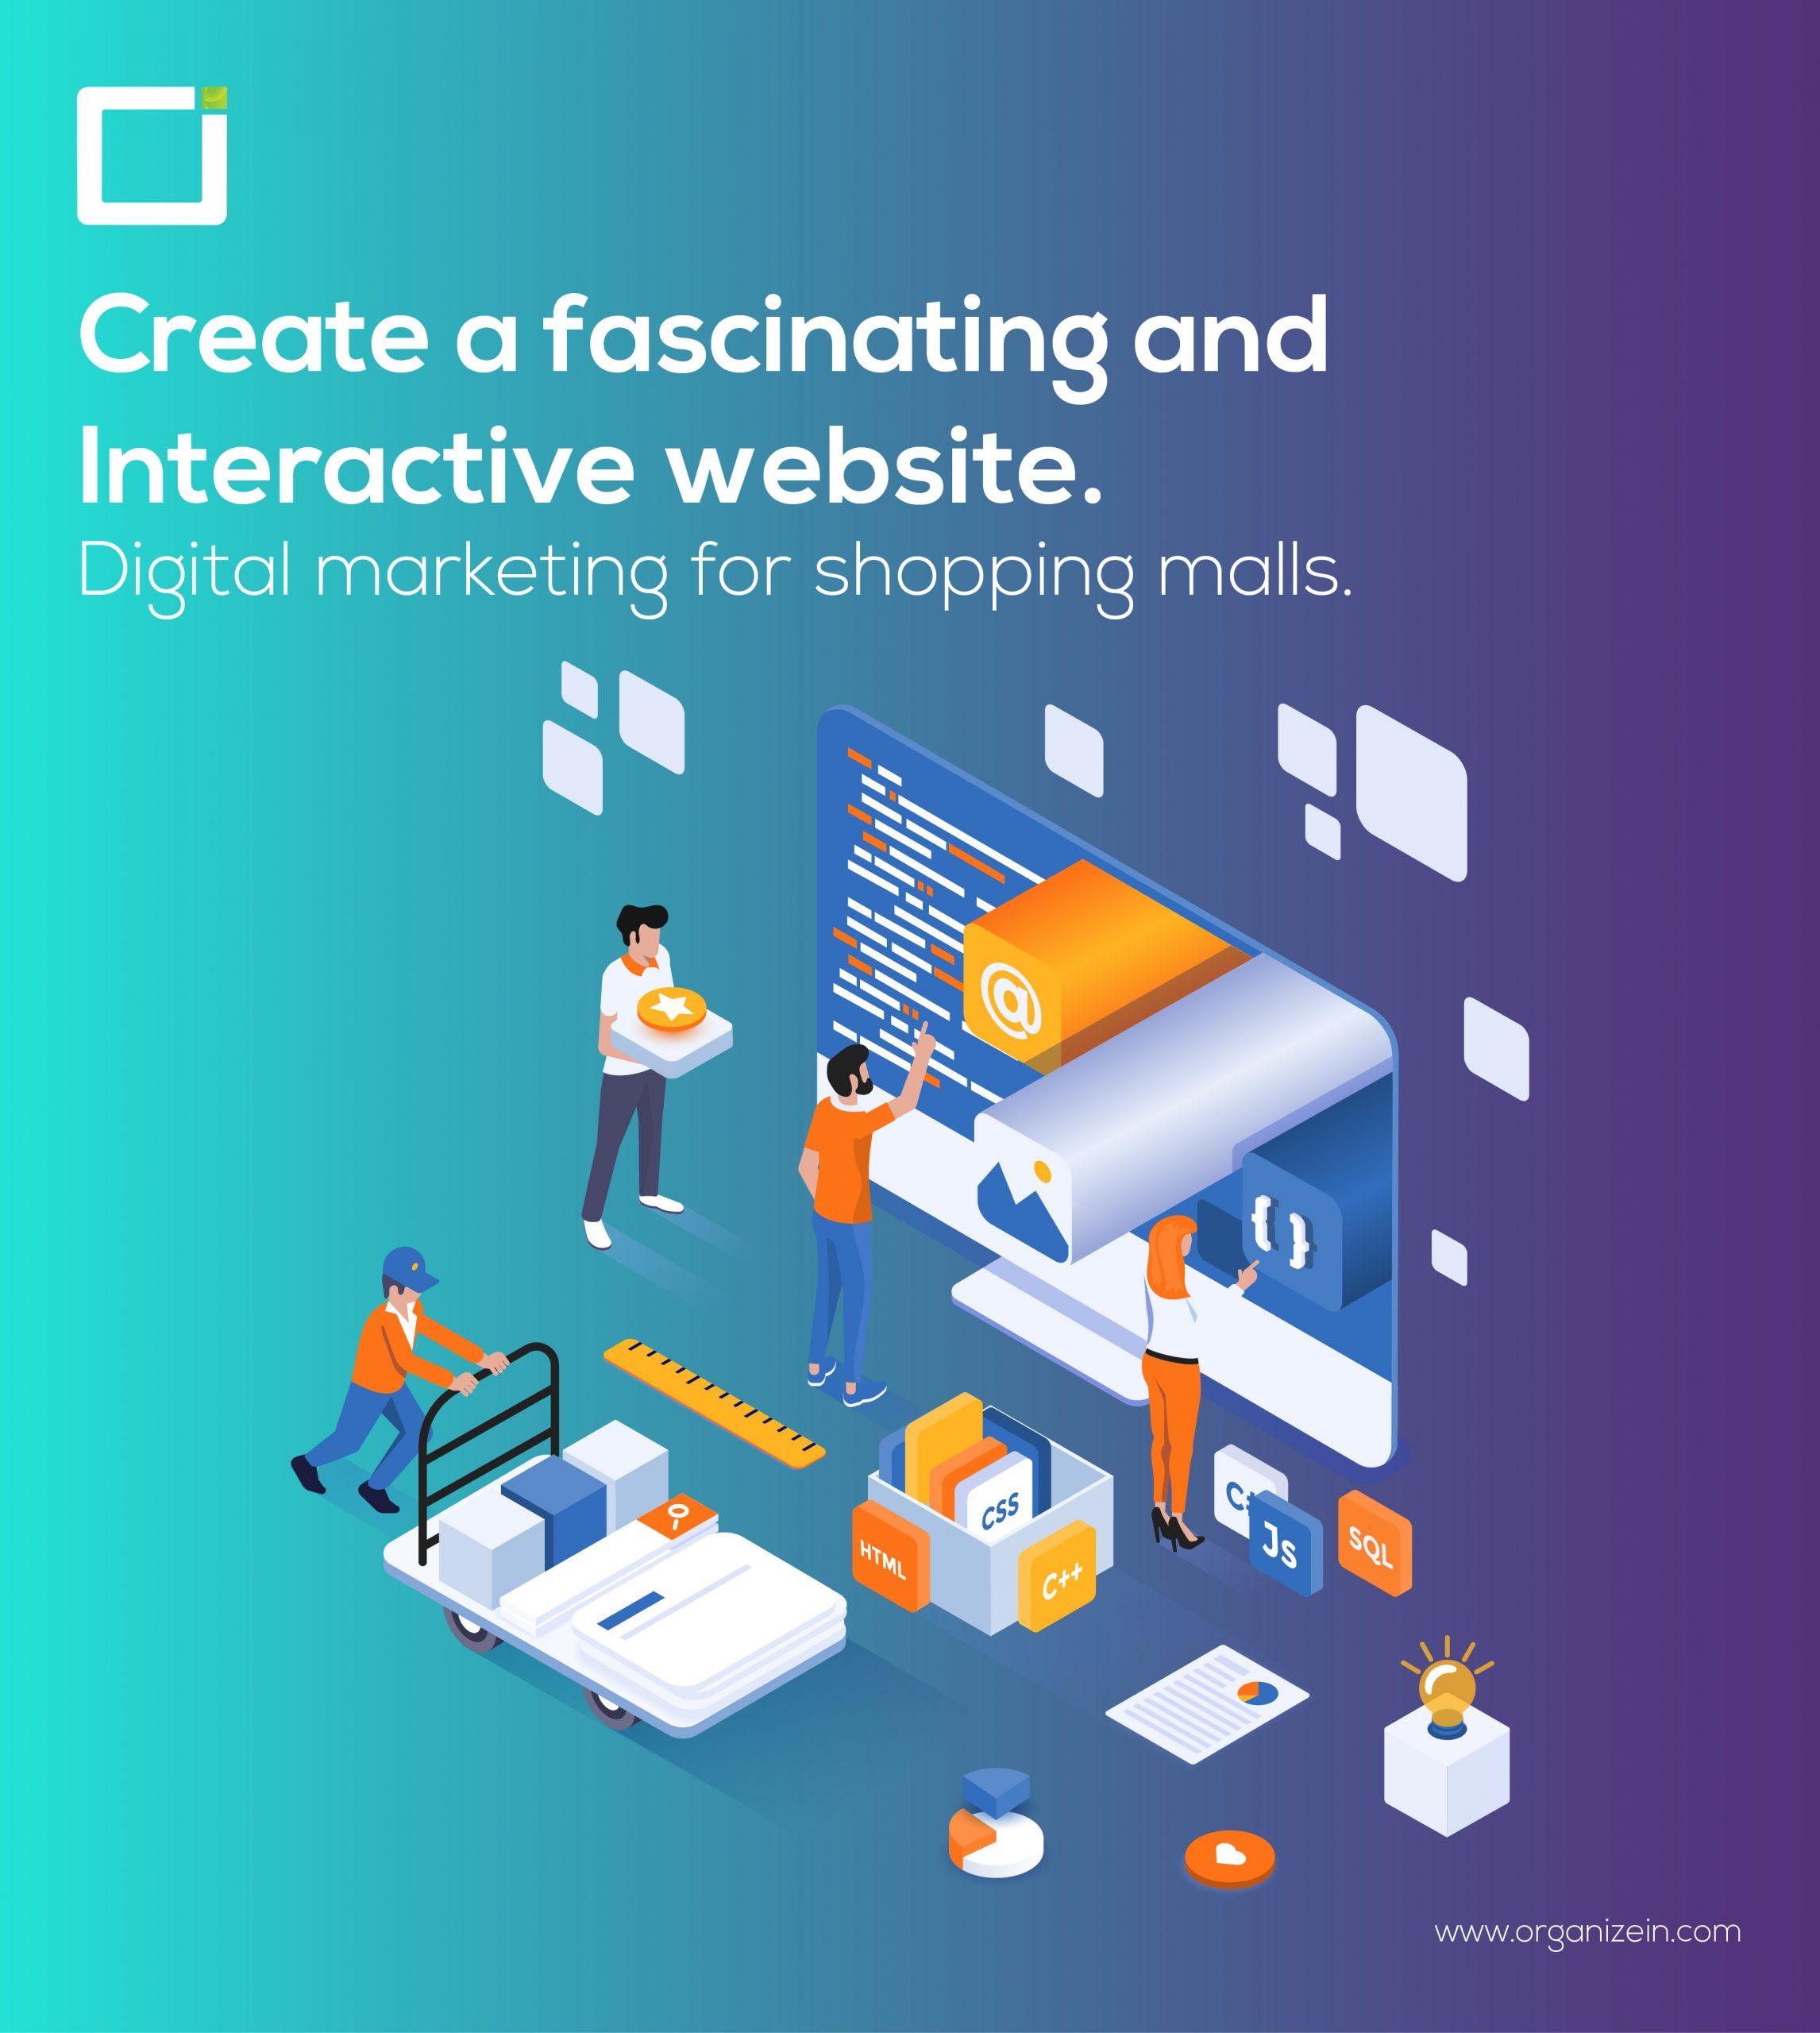 Digital marketing for shopping malls